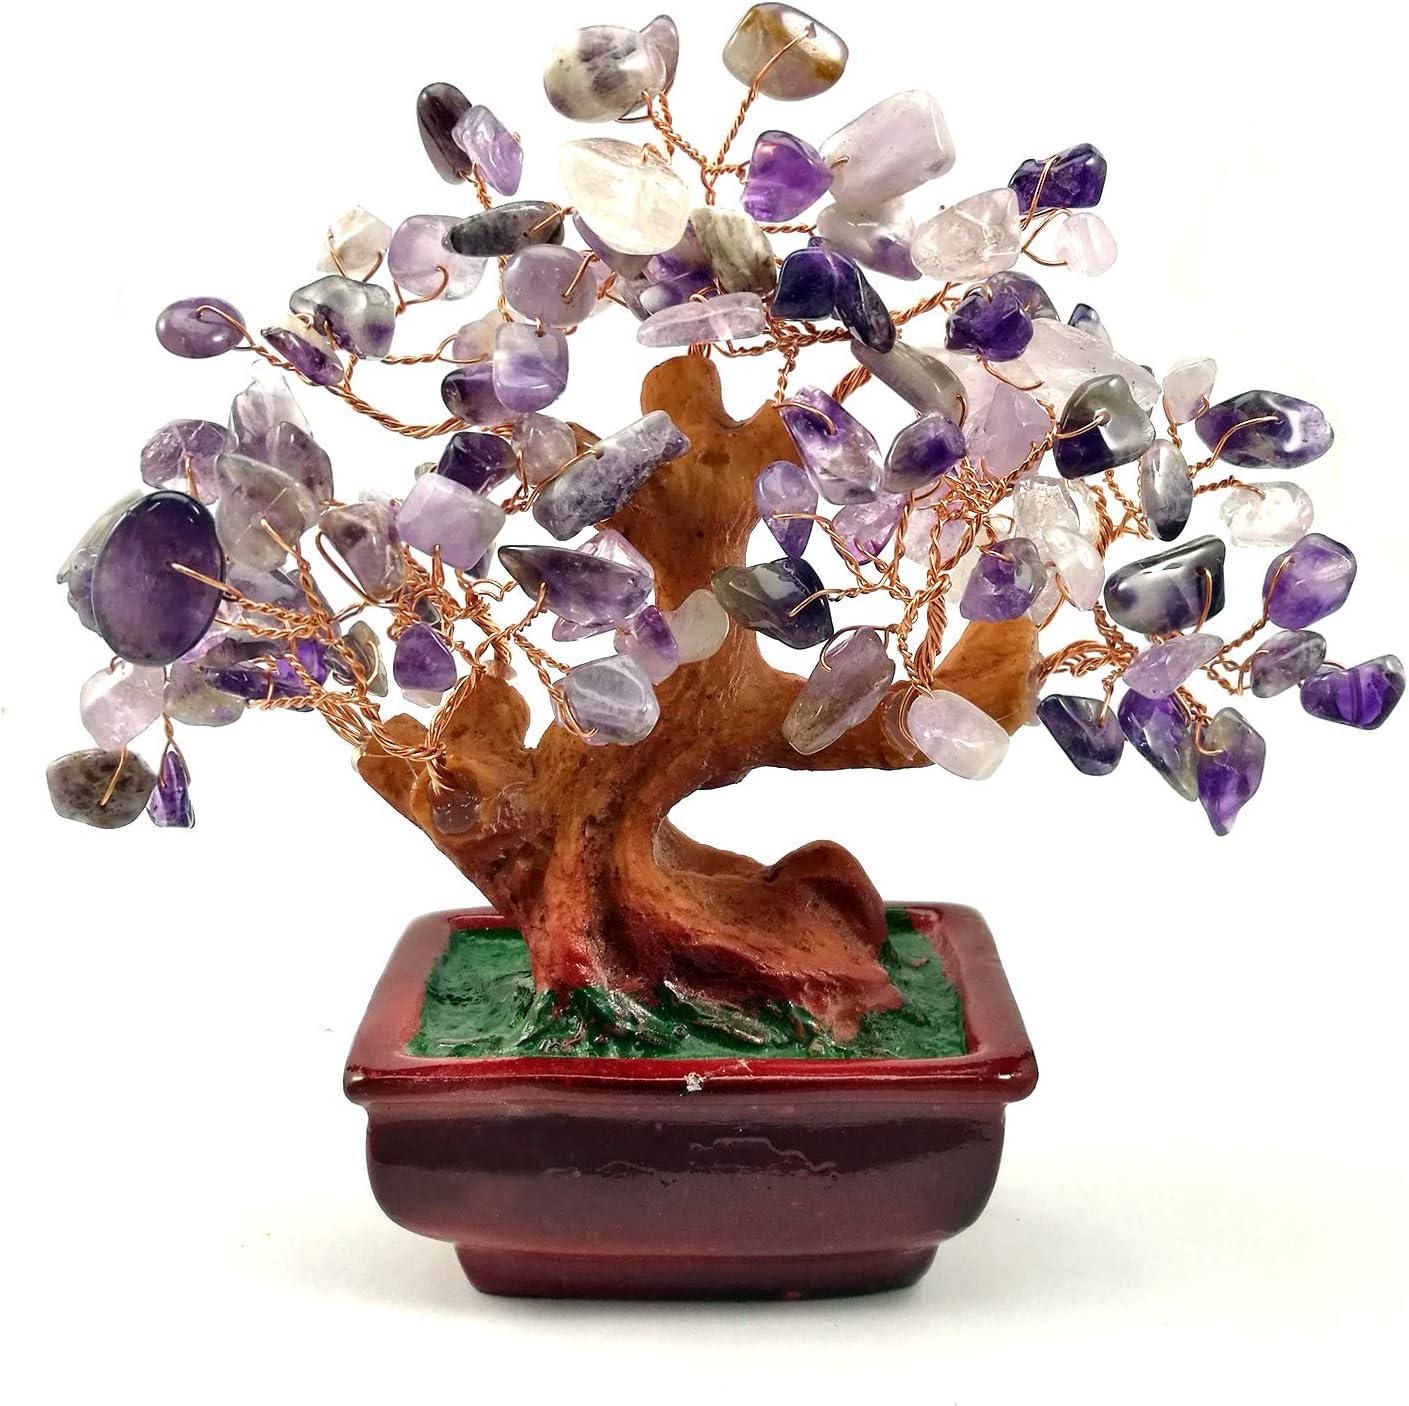 NYKKOLA Mix Gem Stone Money Amethyst Rose Citrine Carnelian Clear Quartz Feng Shui Plants /& Flowers Artificial Trees Green